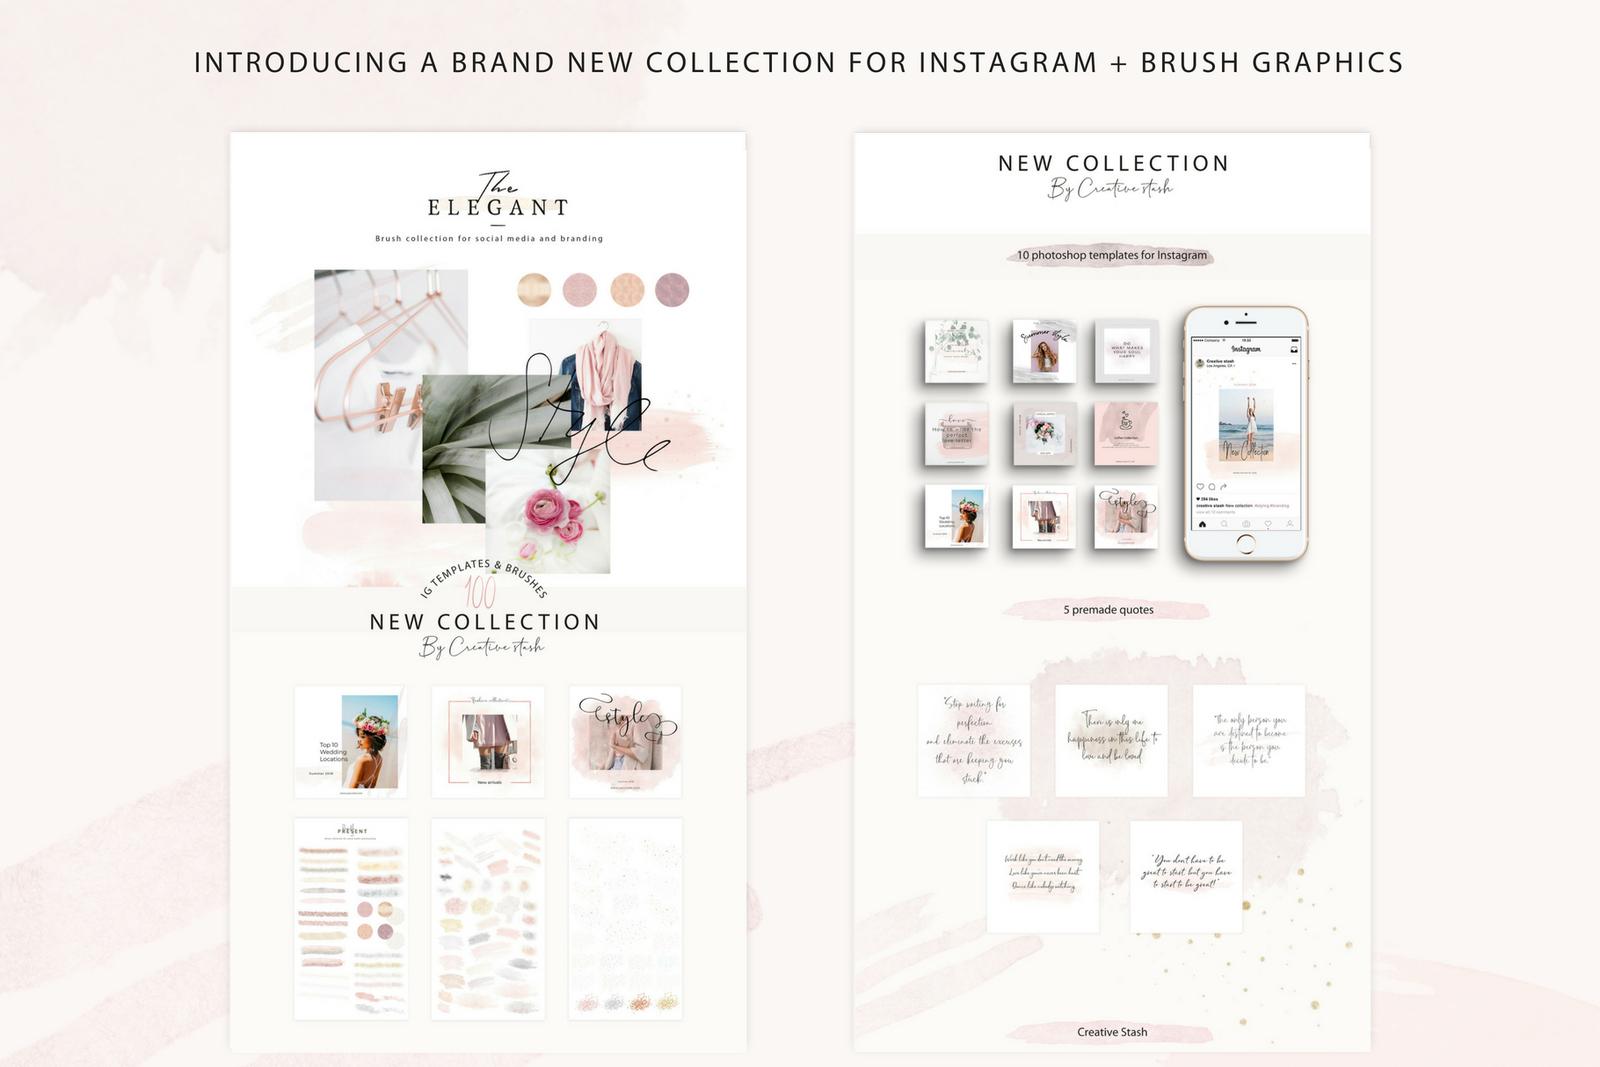 Psd For Instagram Brush Graphics In Social Media Templates On